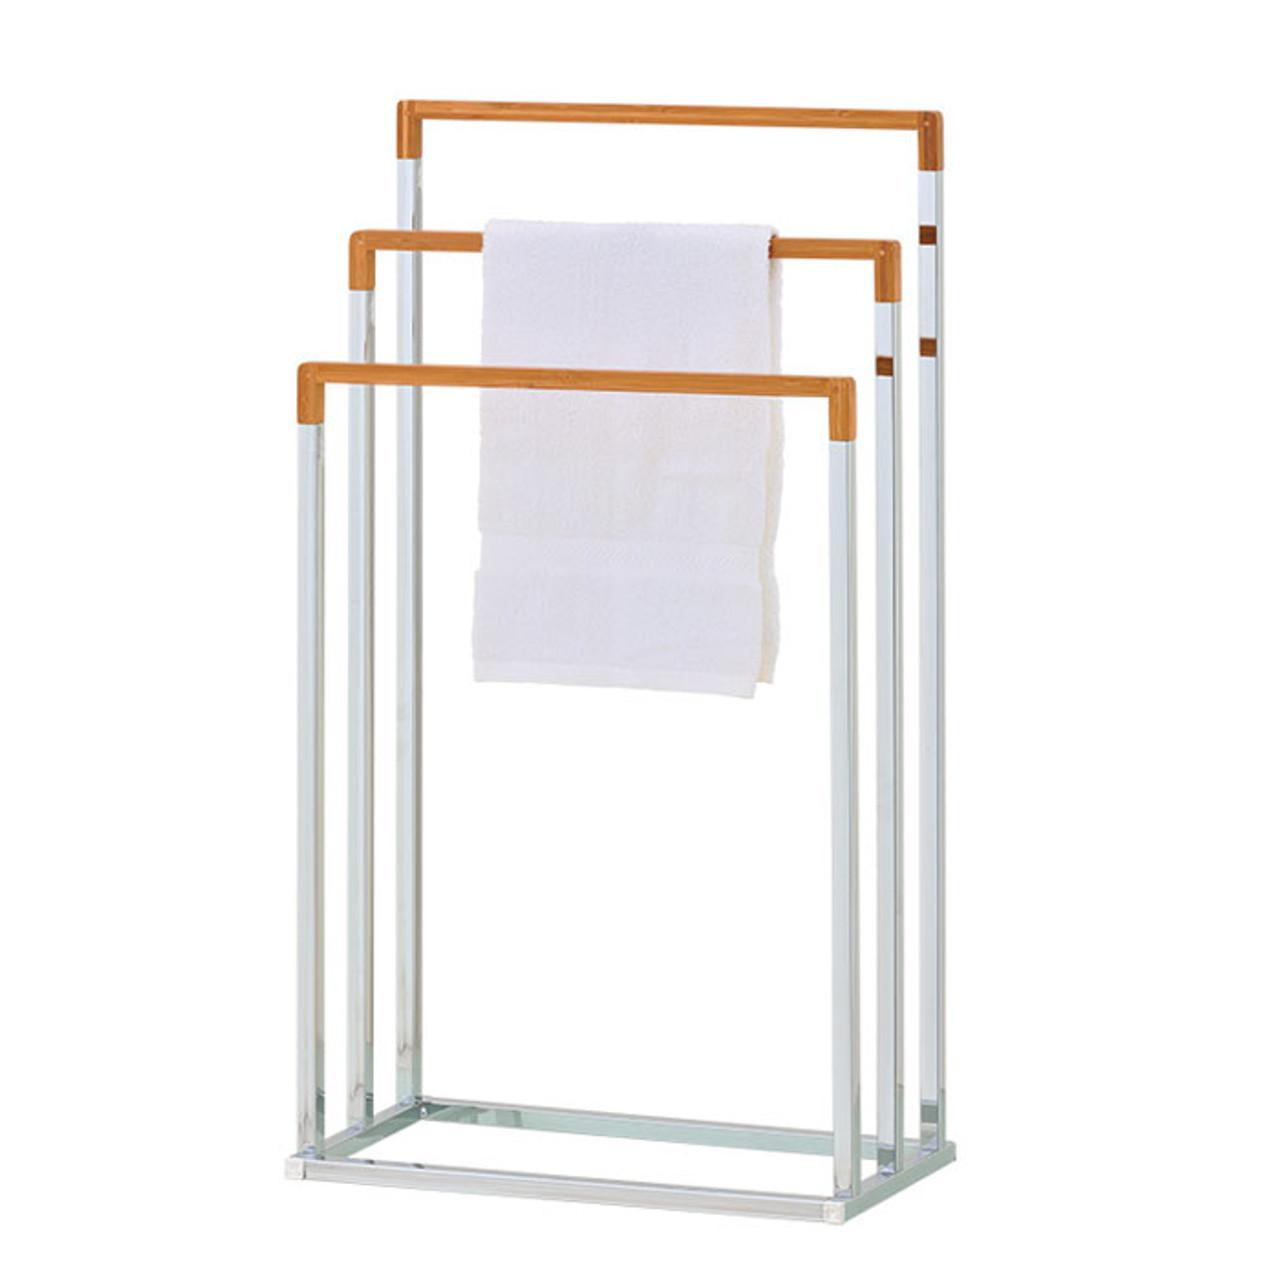 standing towel rack. Bamboo Towel Stand | Rack Bathroom Racks Standing A